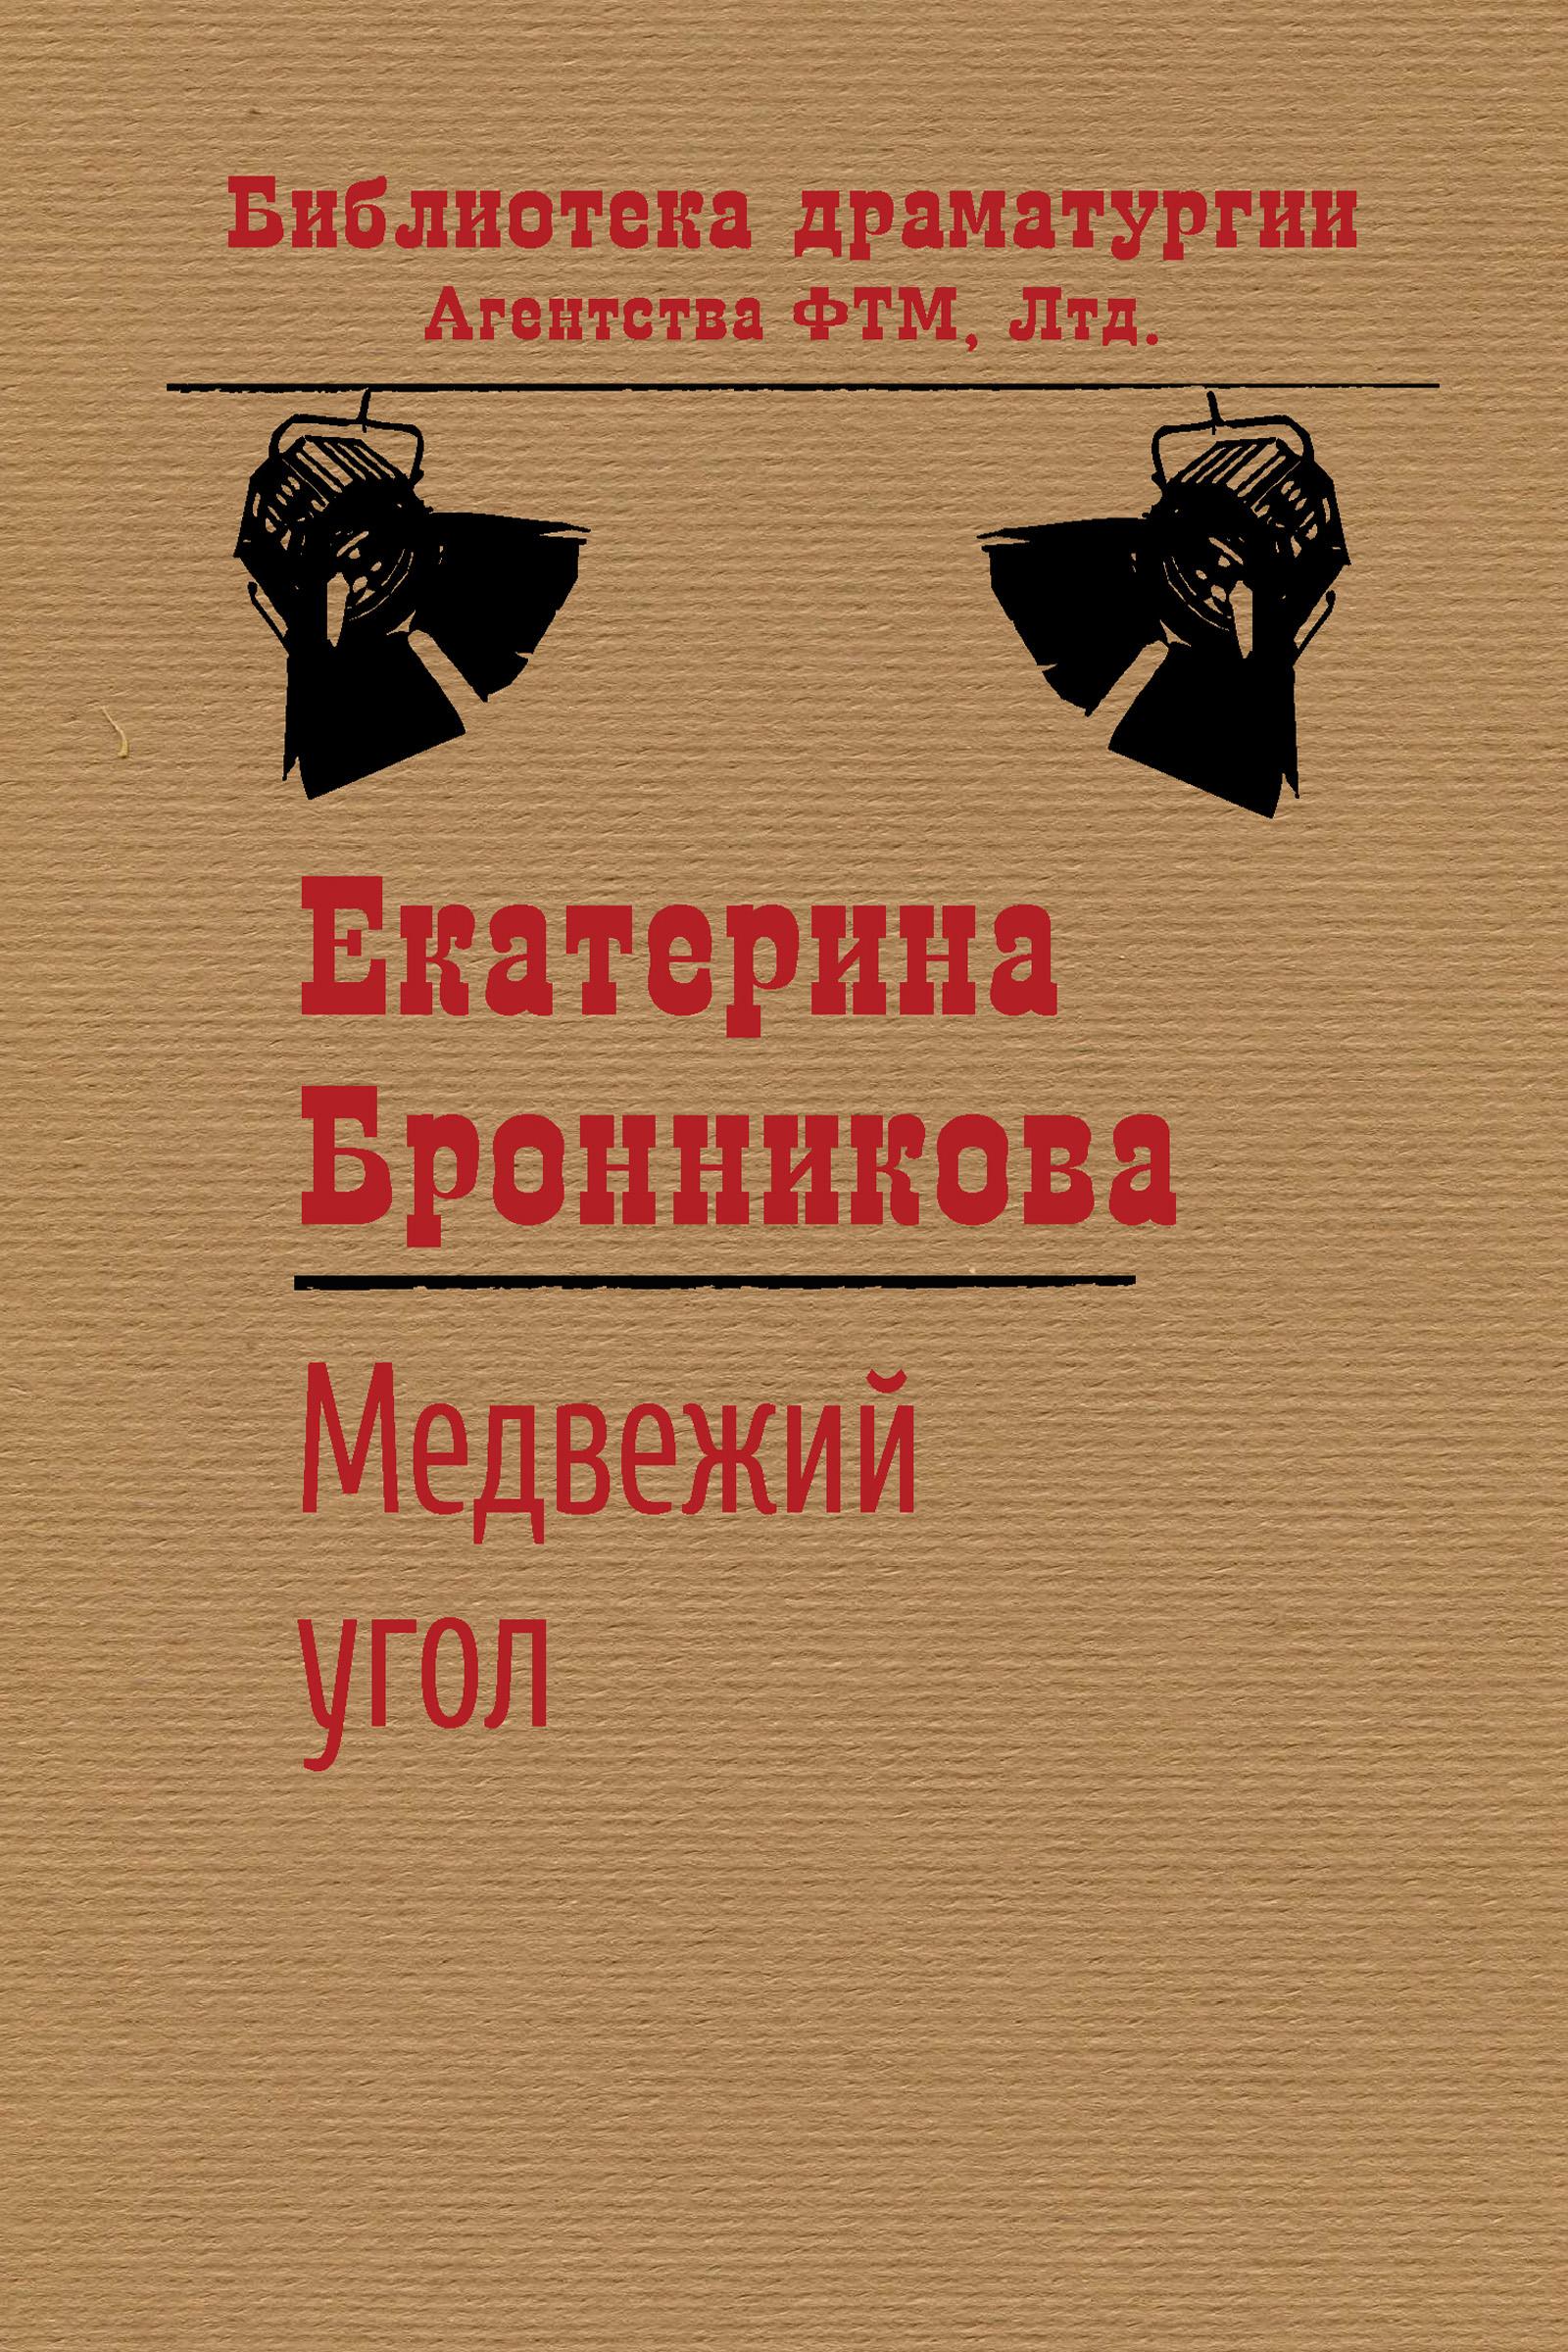 цена Екатерина Бронникова Медвежий угол